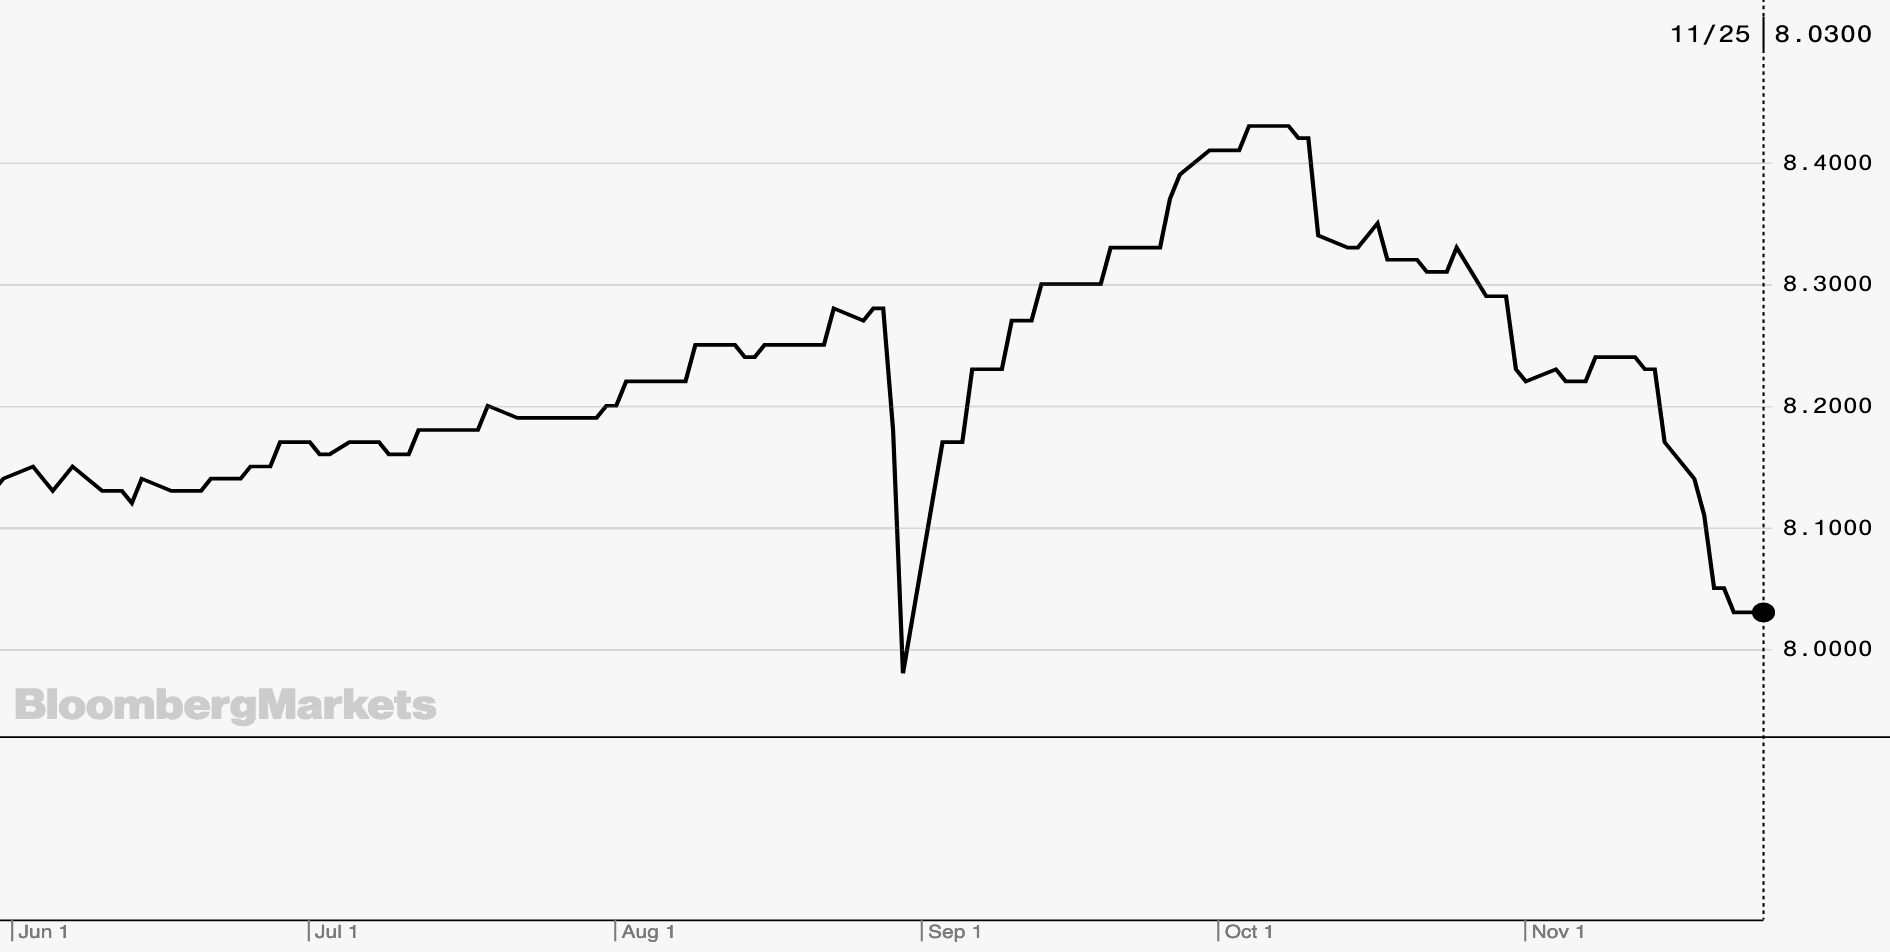 stone-ridge-reinsurance-ils-interval-fund-price